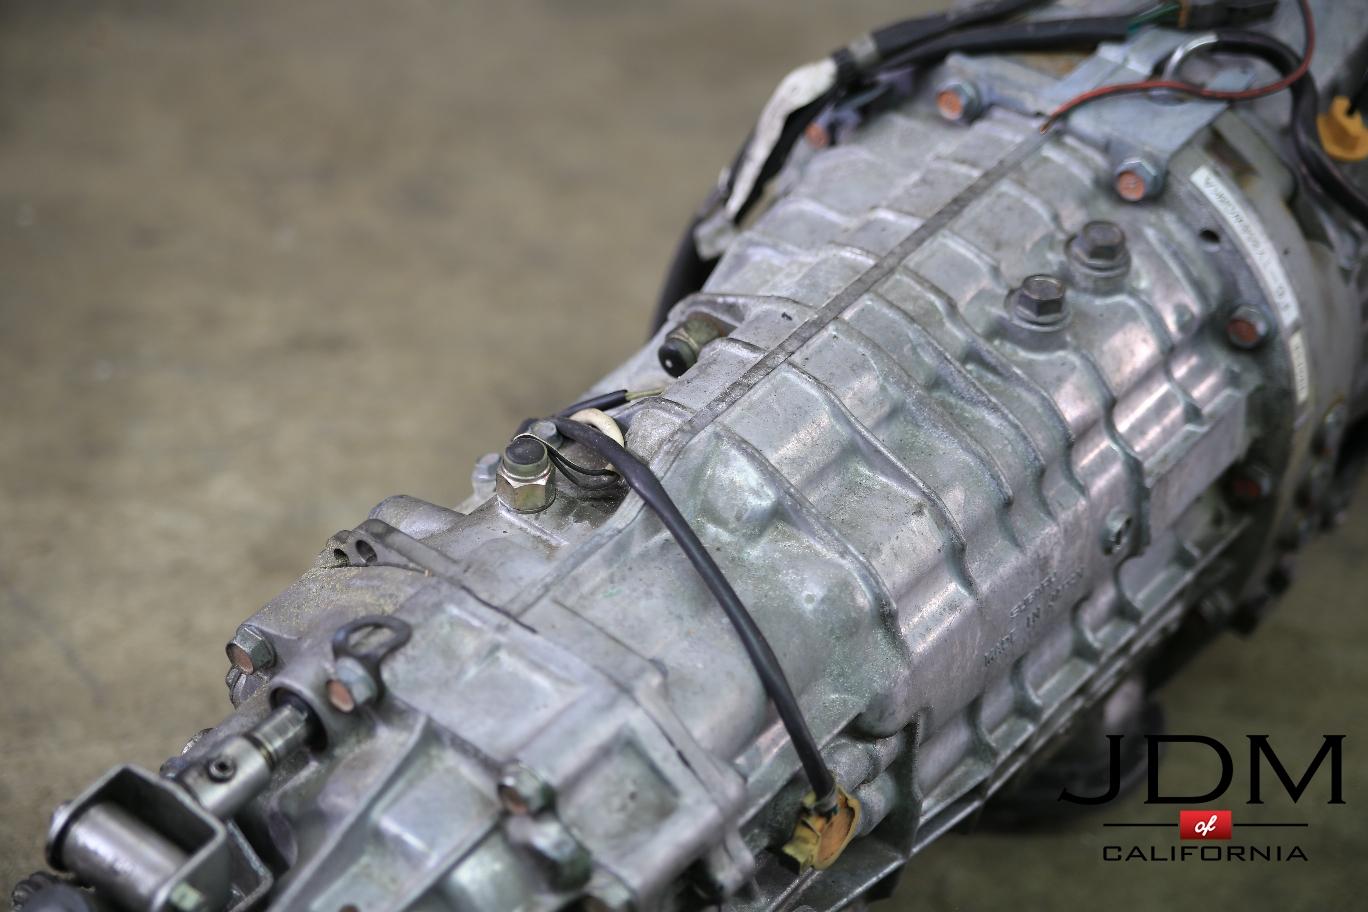 JDM Subaru Wrx Sti 2004-2005 6 Speed Manual Transmission   JDM of California